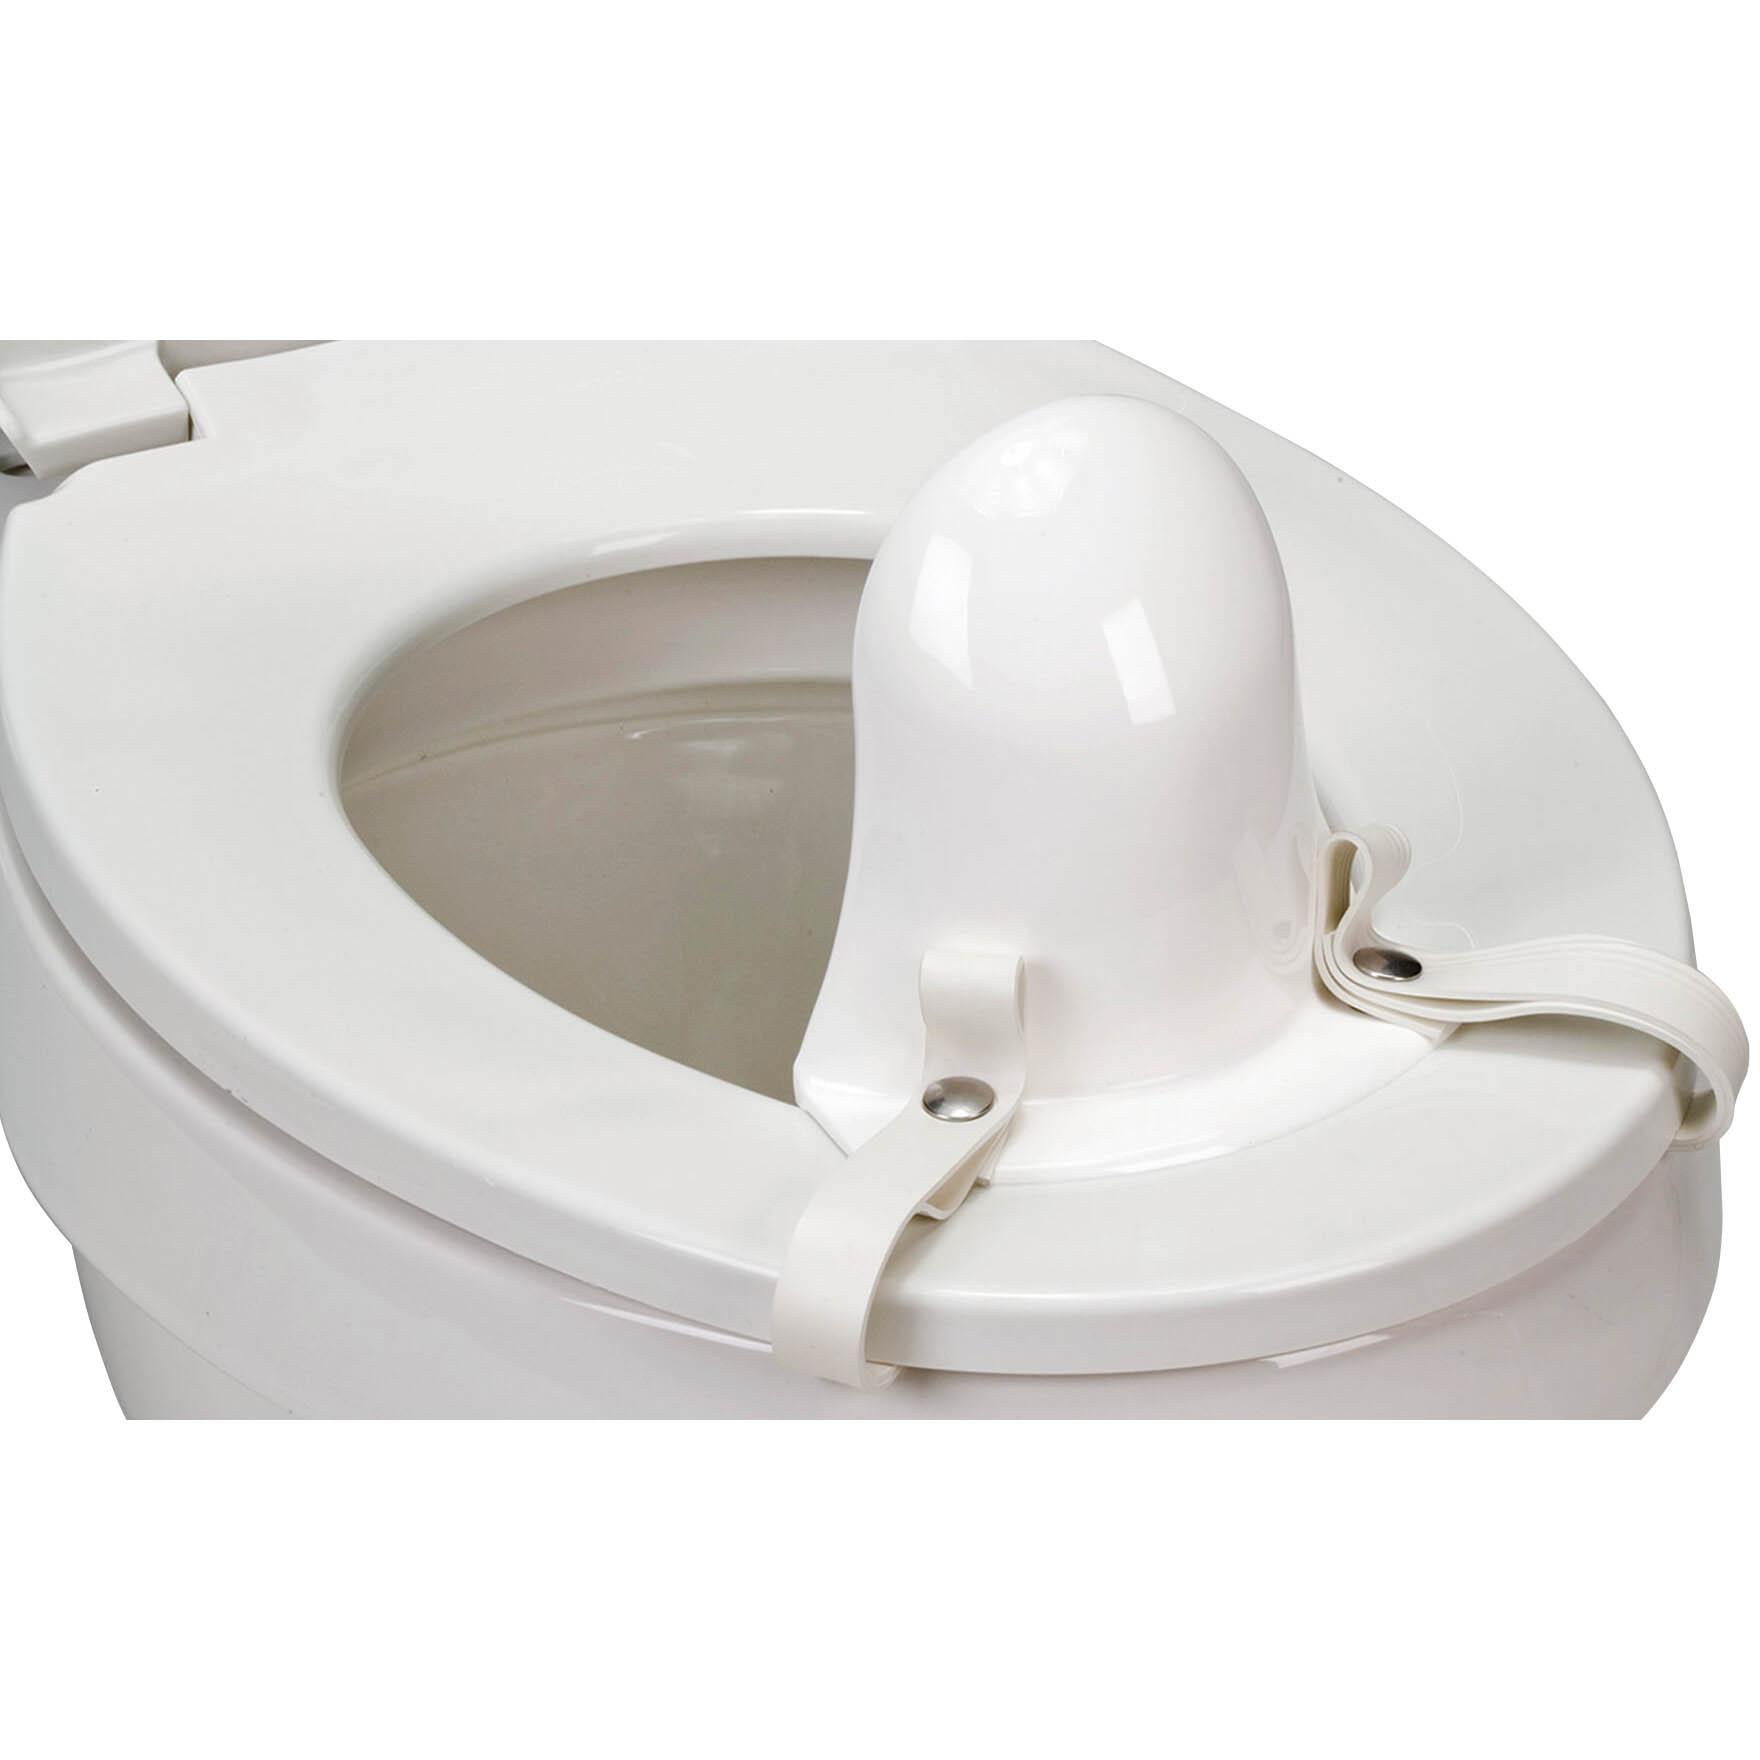 Soft-Flex splash guard for toilet support system